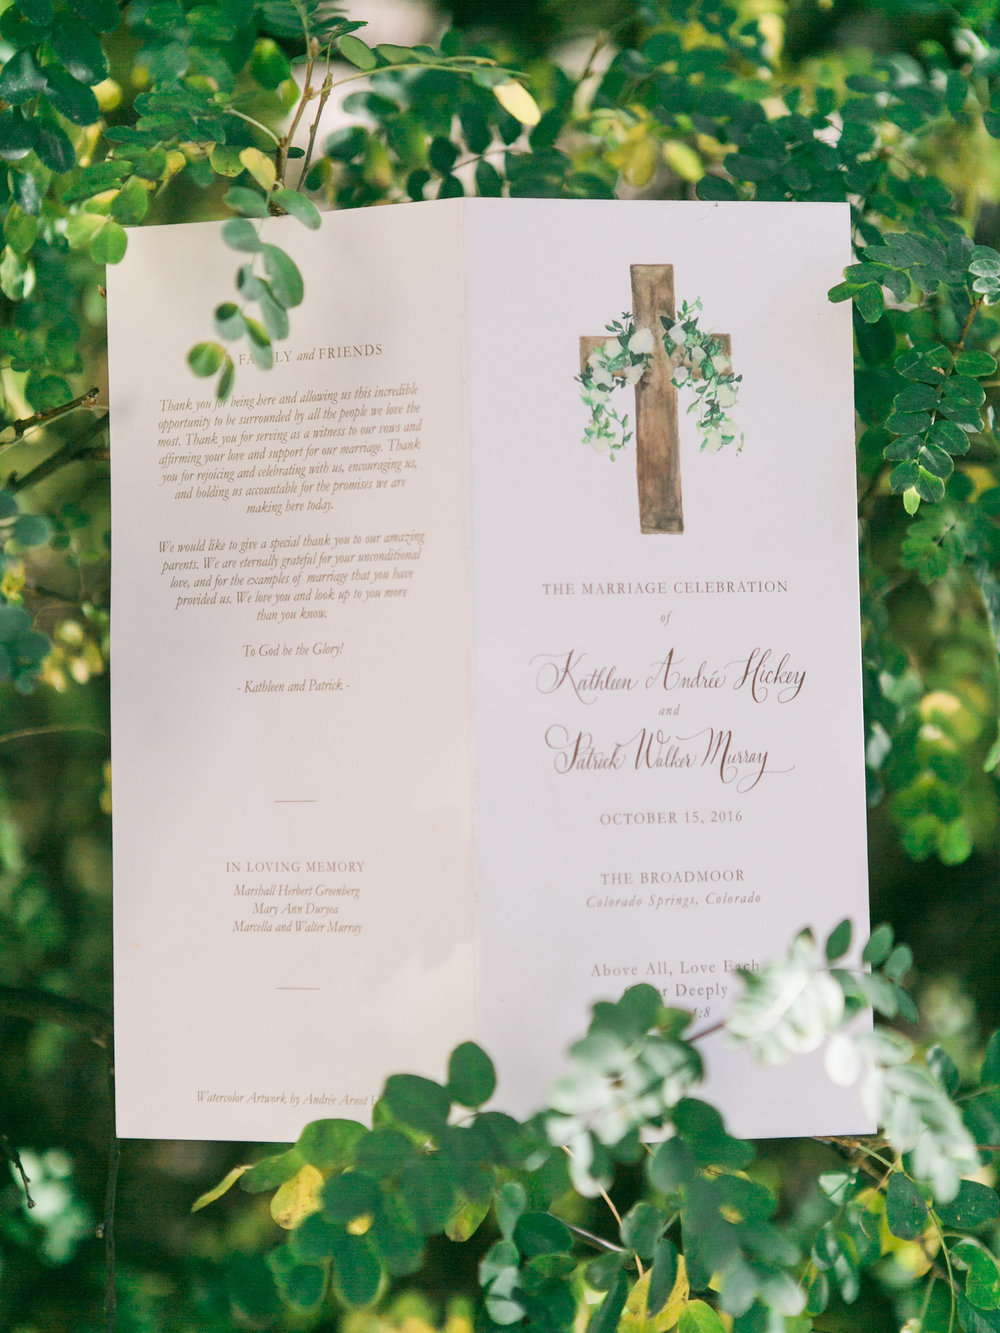 kathleen-patrick-wedding-details-94.jpg